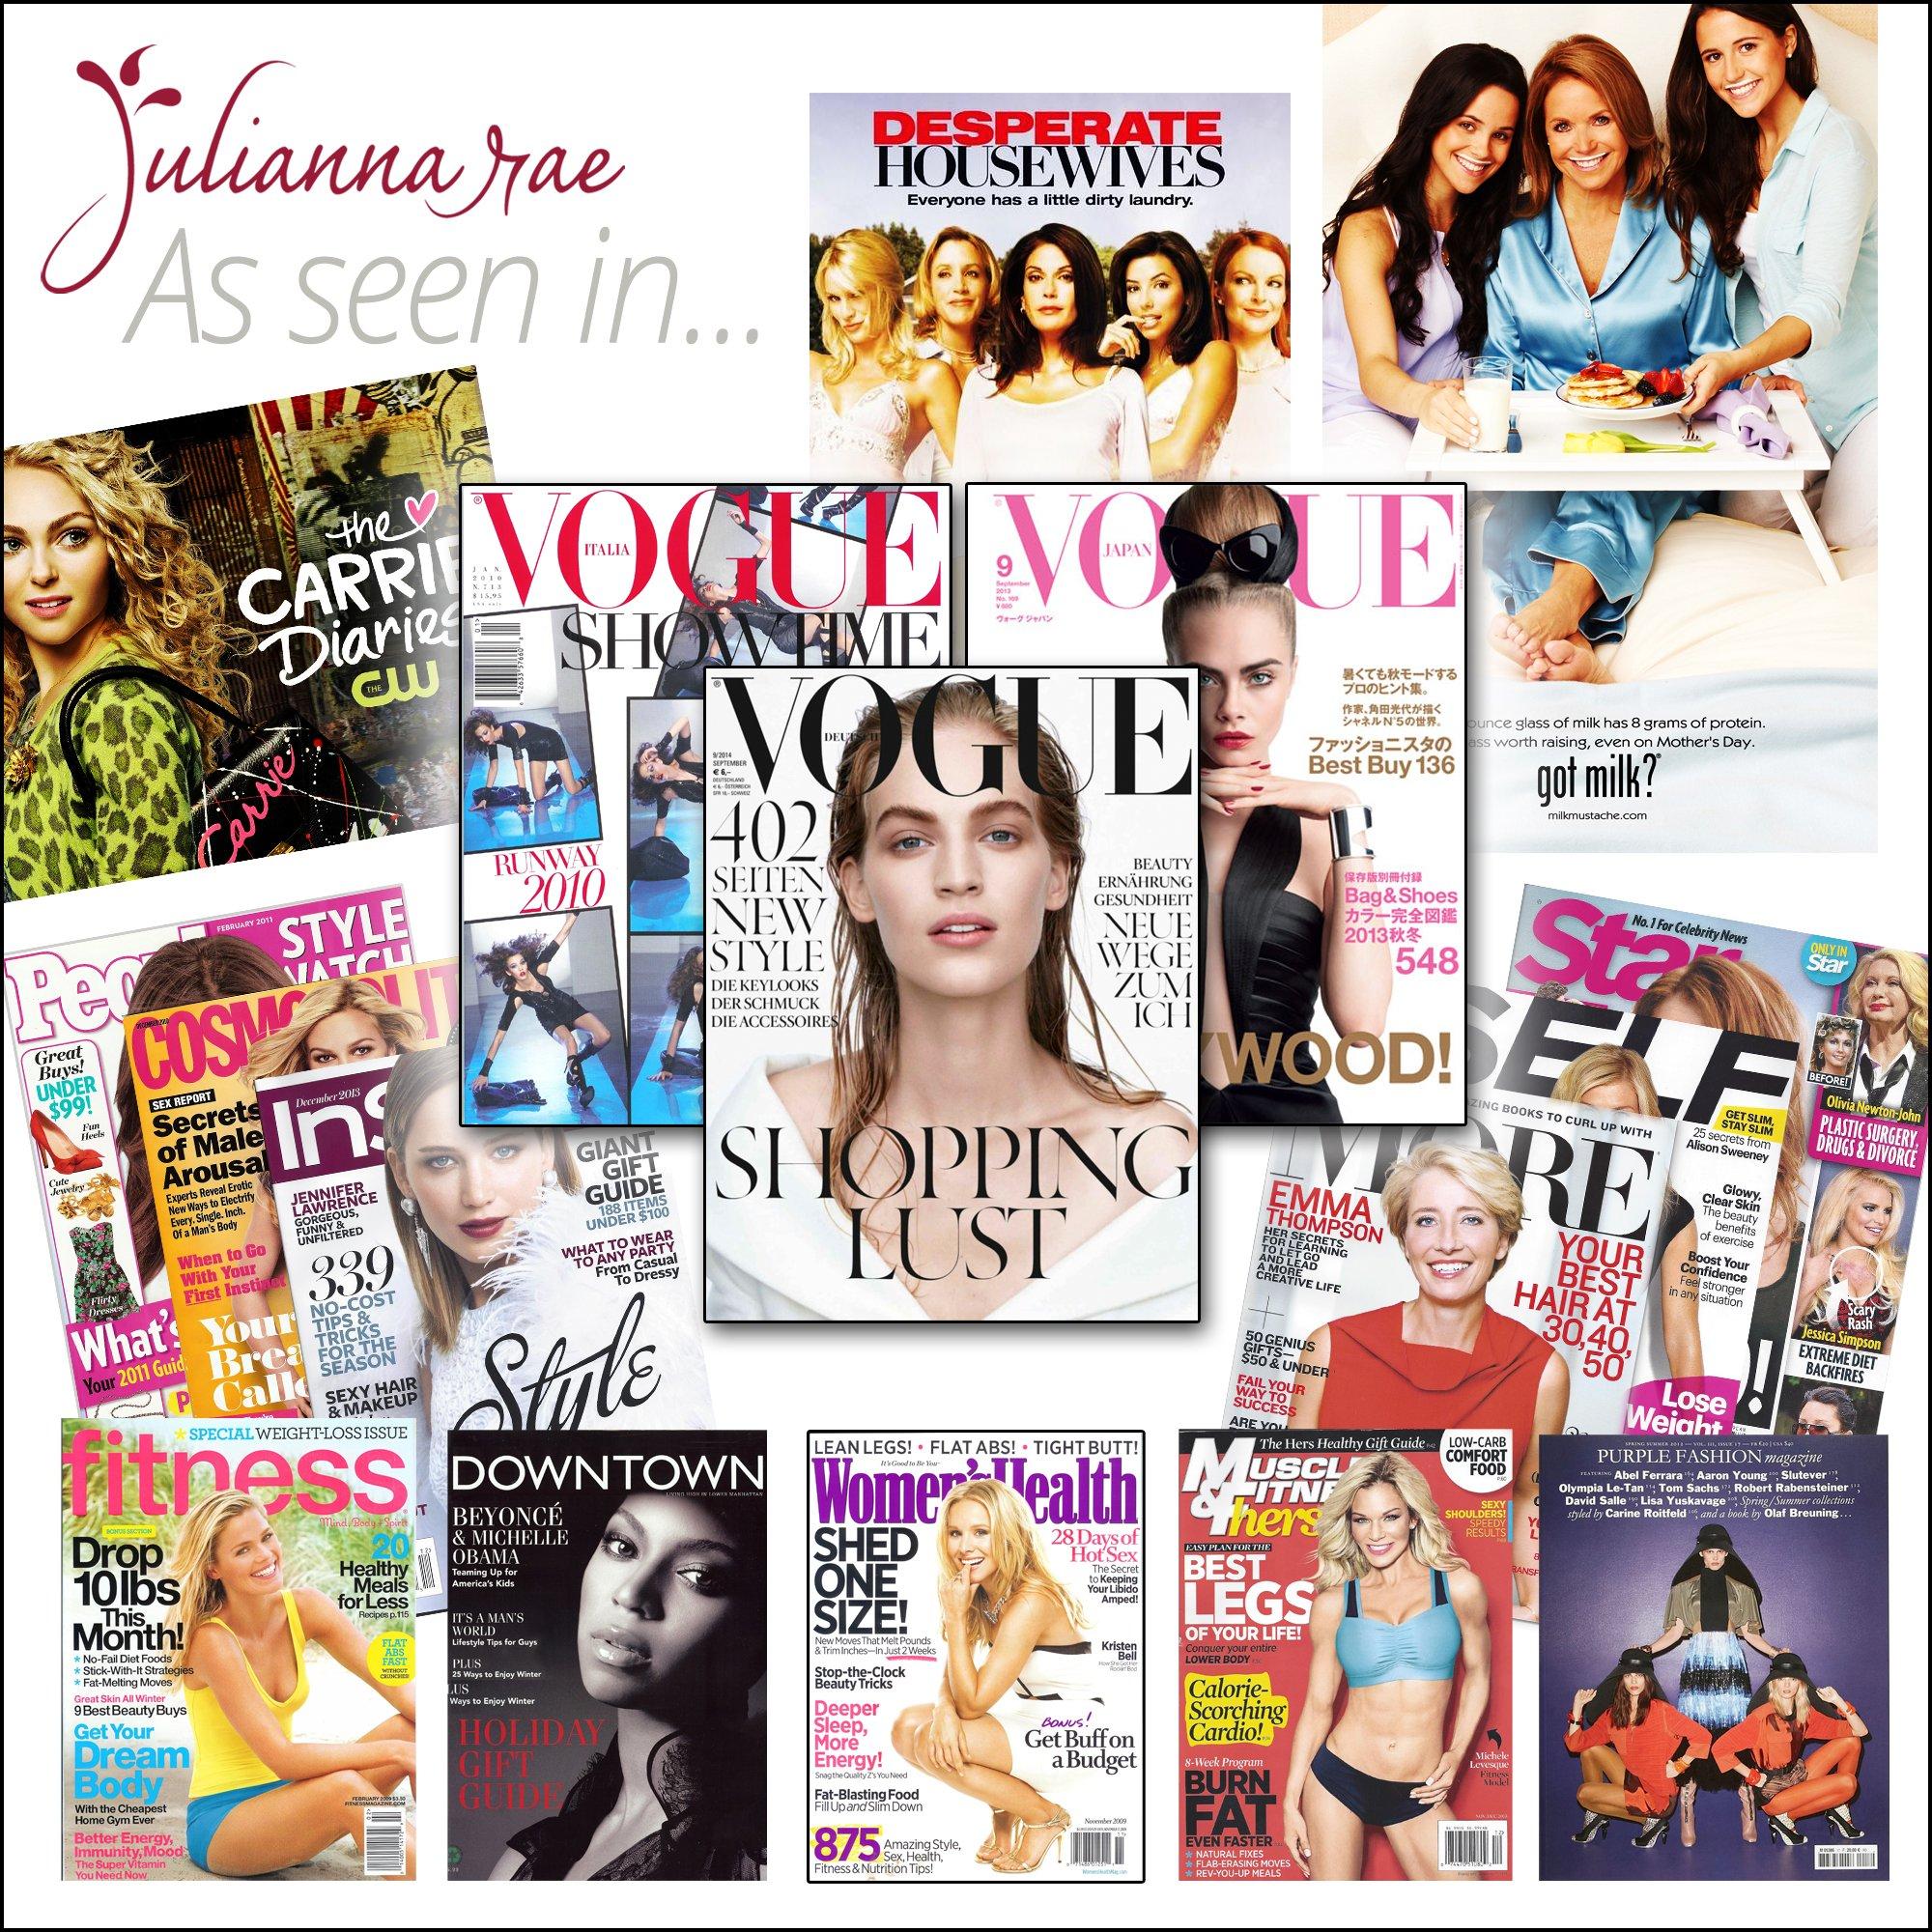 Julianna Rae Women's 100% Silk Pajama, Classic Fit, Evening Lounge, Alabaster, Petite, M by Julianna Rae (Image #5)